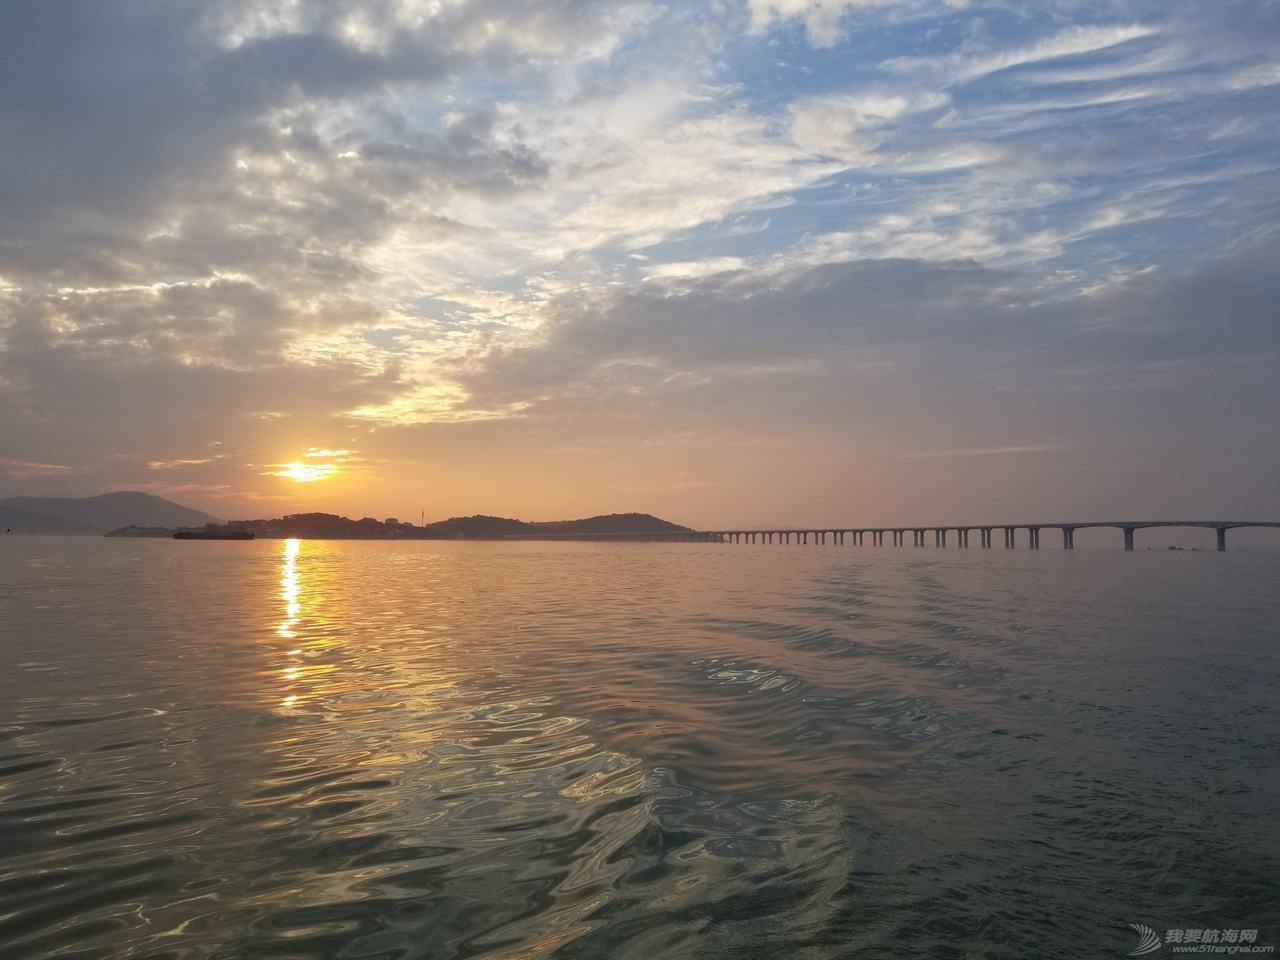 nbsp,到了,航海,我们,帆船 人生中的第一次--2017环太湖帆船赛  234020hzfgagasan2rfuhr